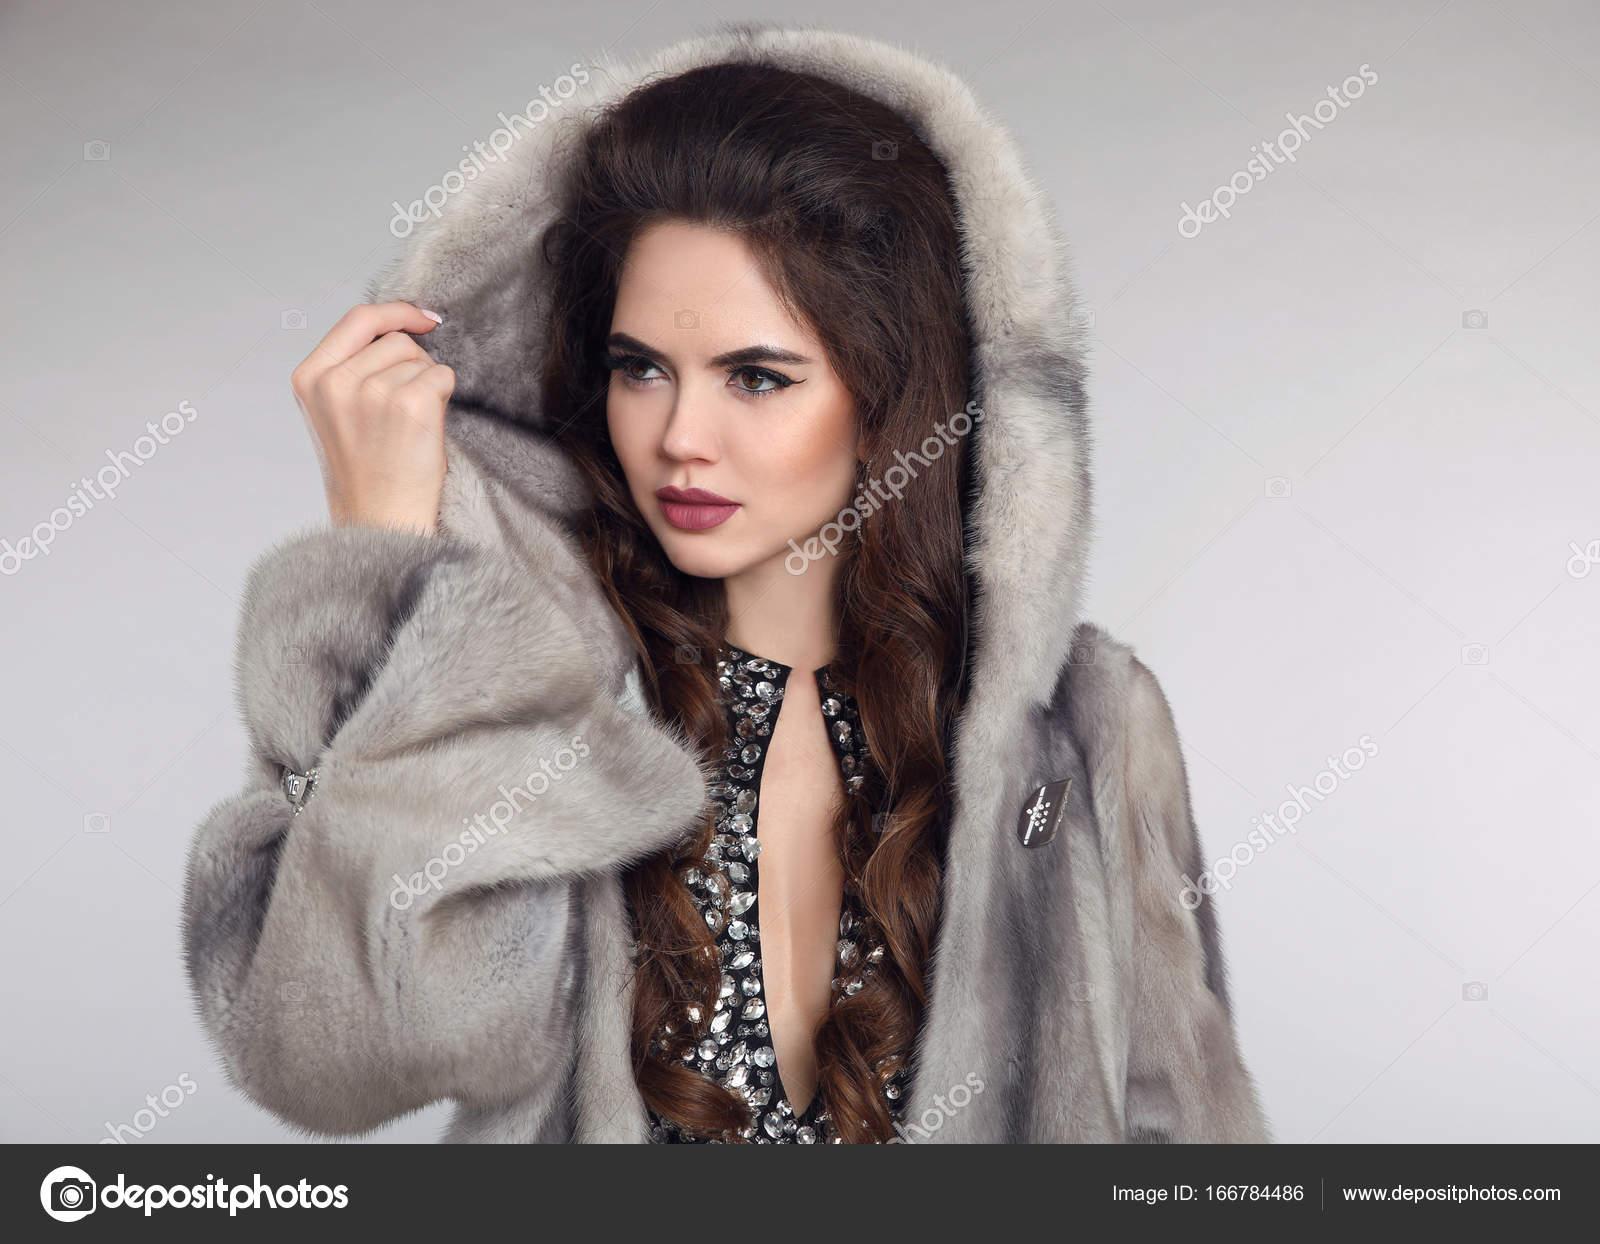 0708f12de317 Σιβηρίας γυναίκα στο παλτό γούνα βιζόν studio γκρι φόντο. FAS — Φωτογραφία  Αρχείου